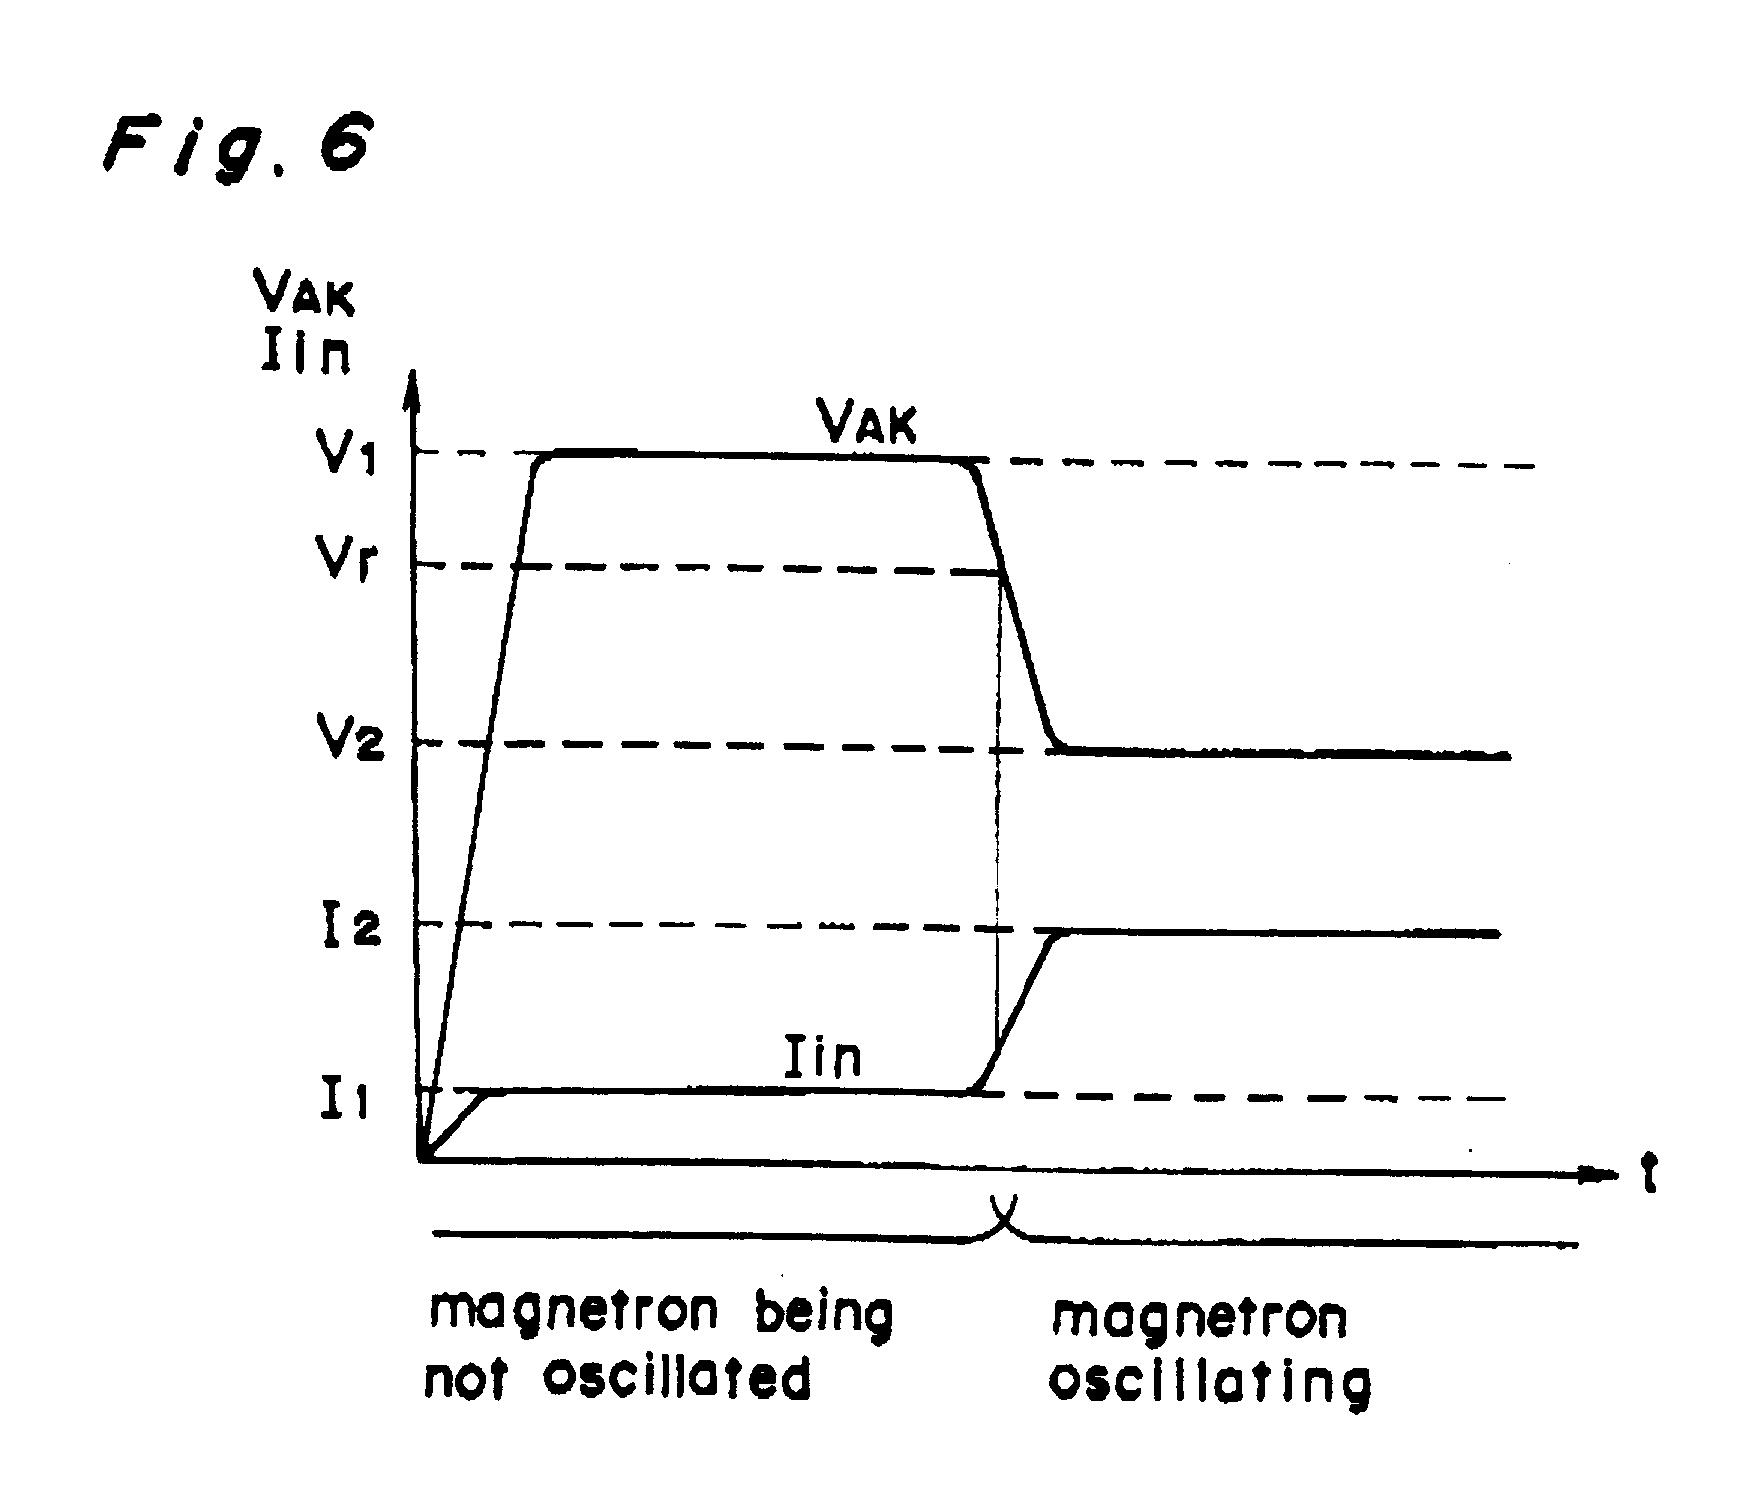 WRG-8096] Magnetron Wiring Diagram on